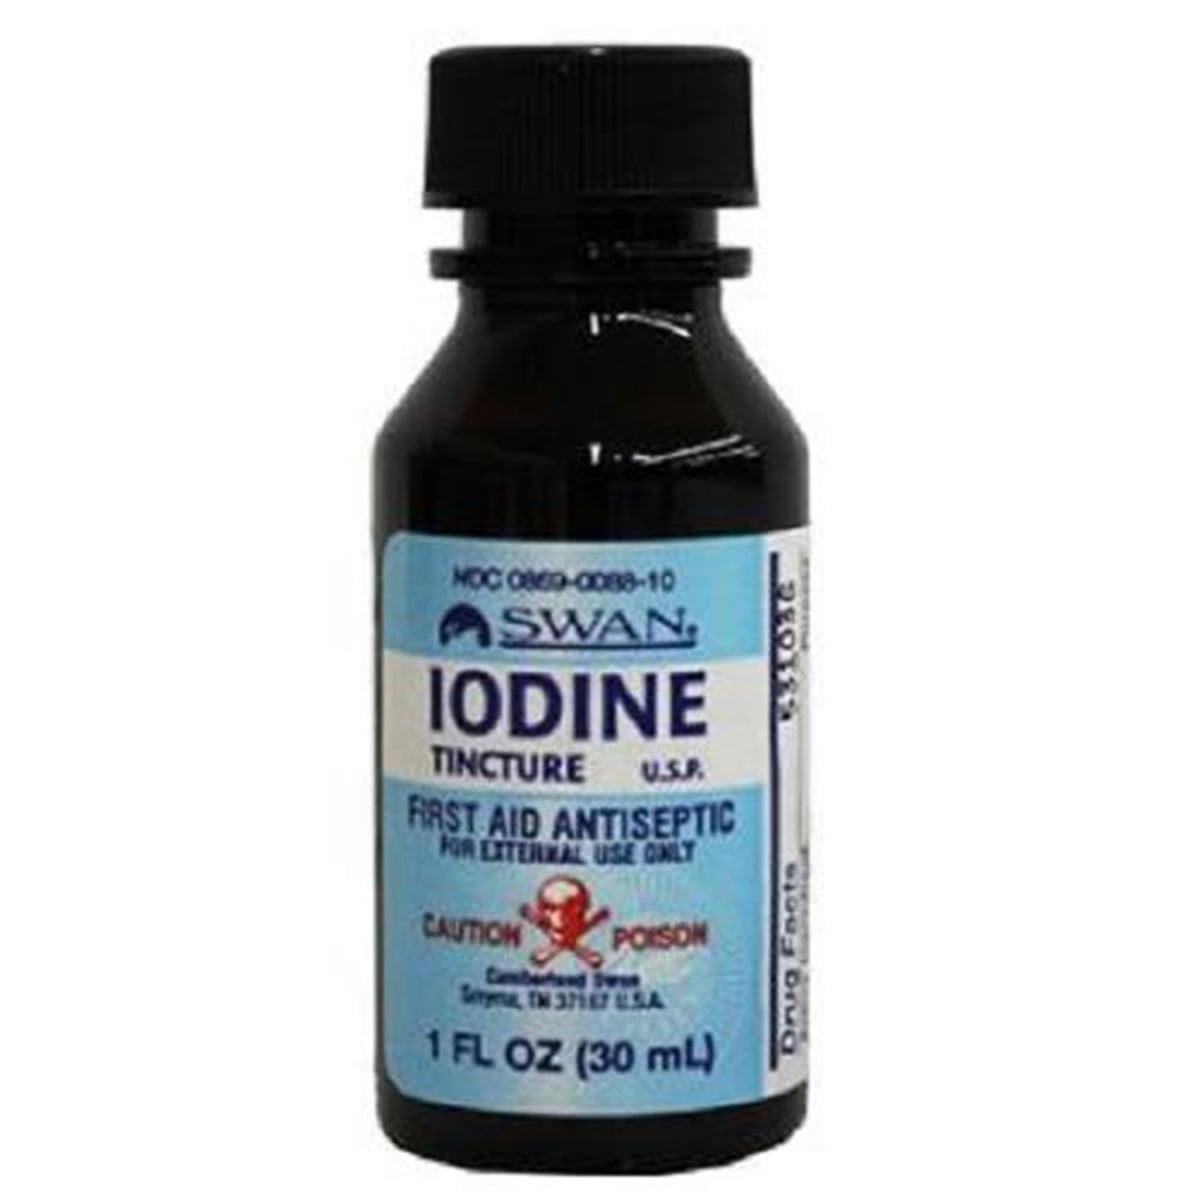 Swan Iodine Tincture, 1 fl. oz.